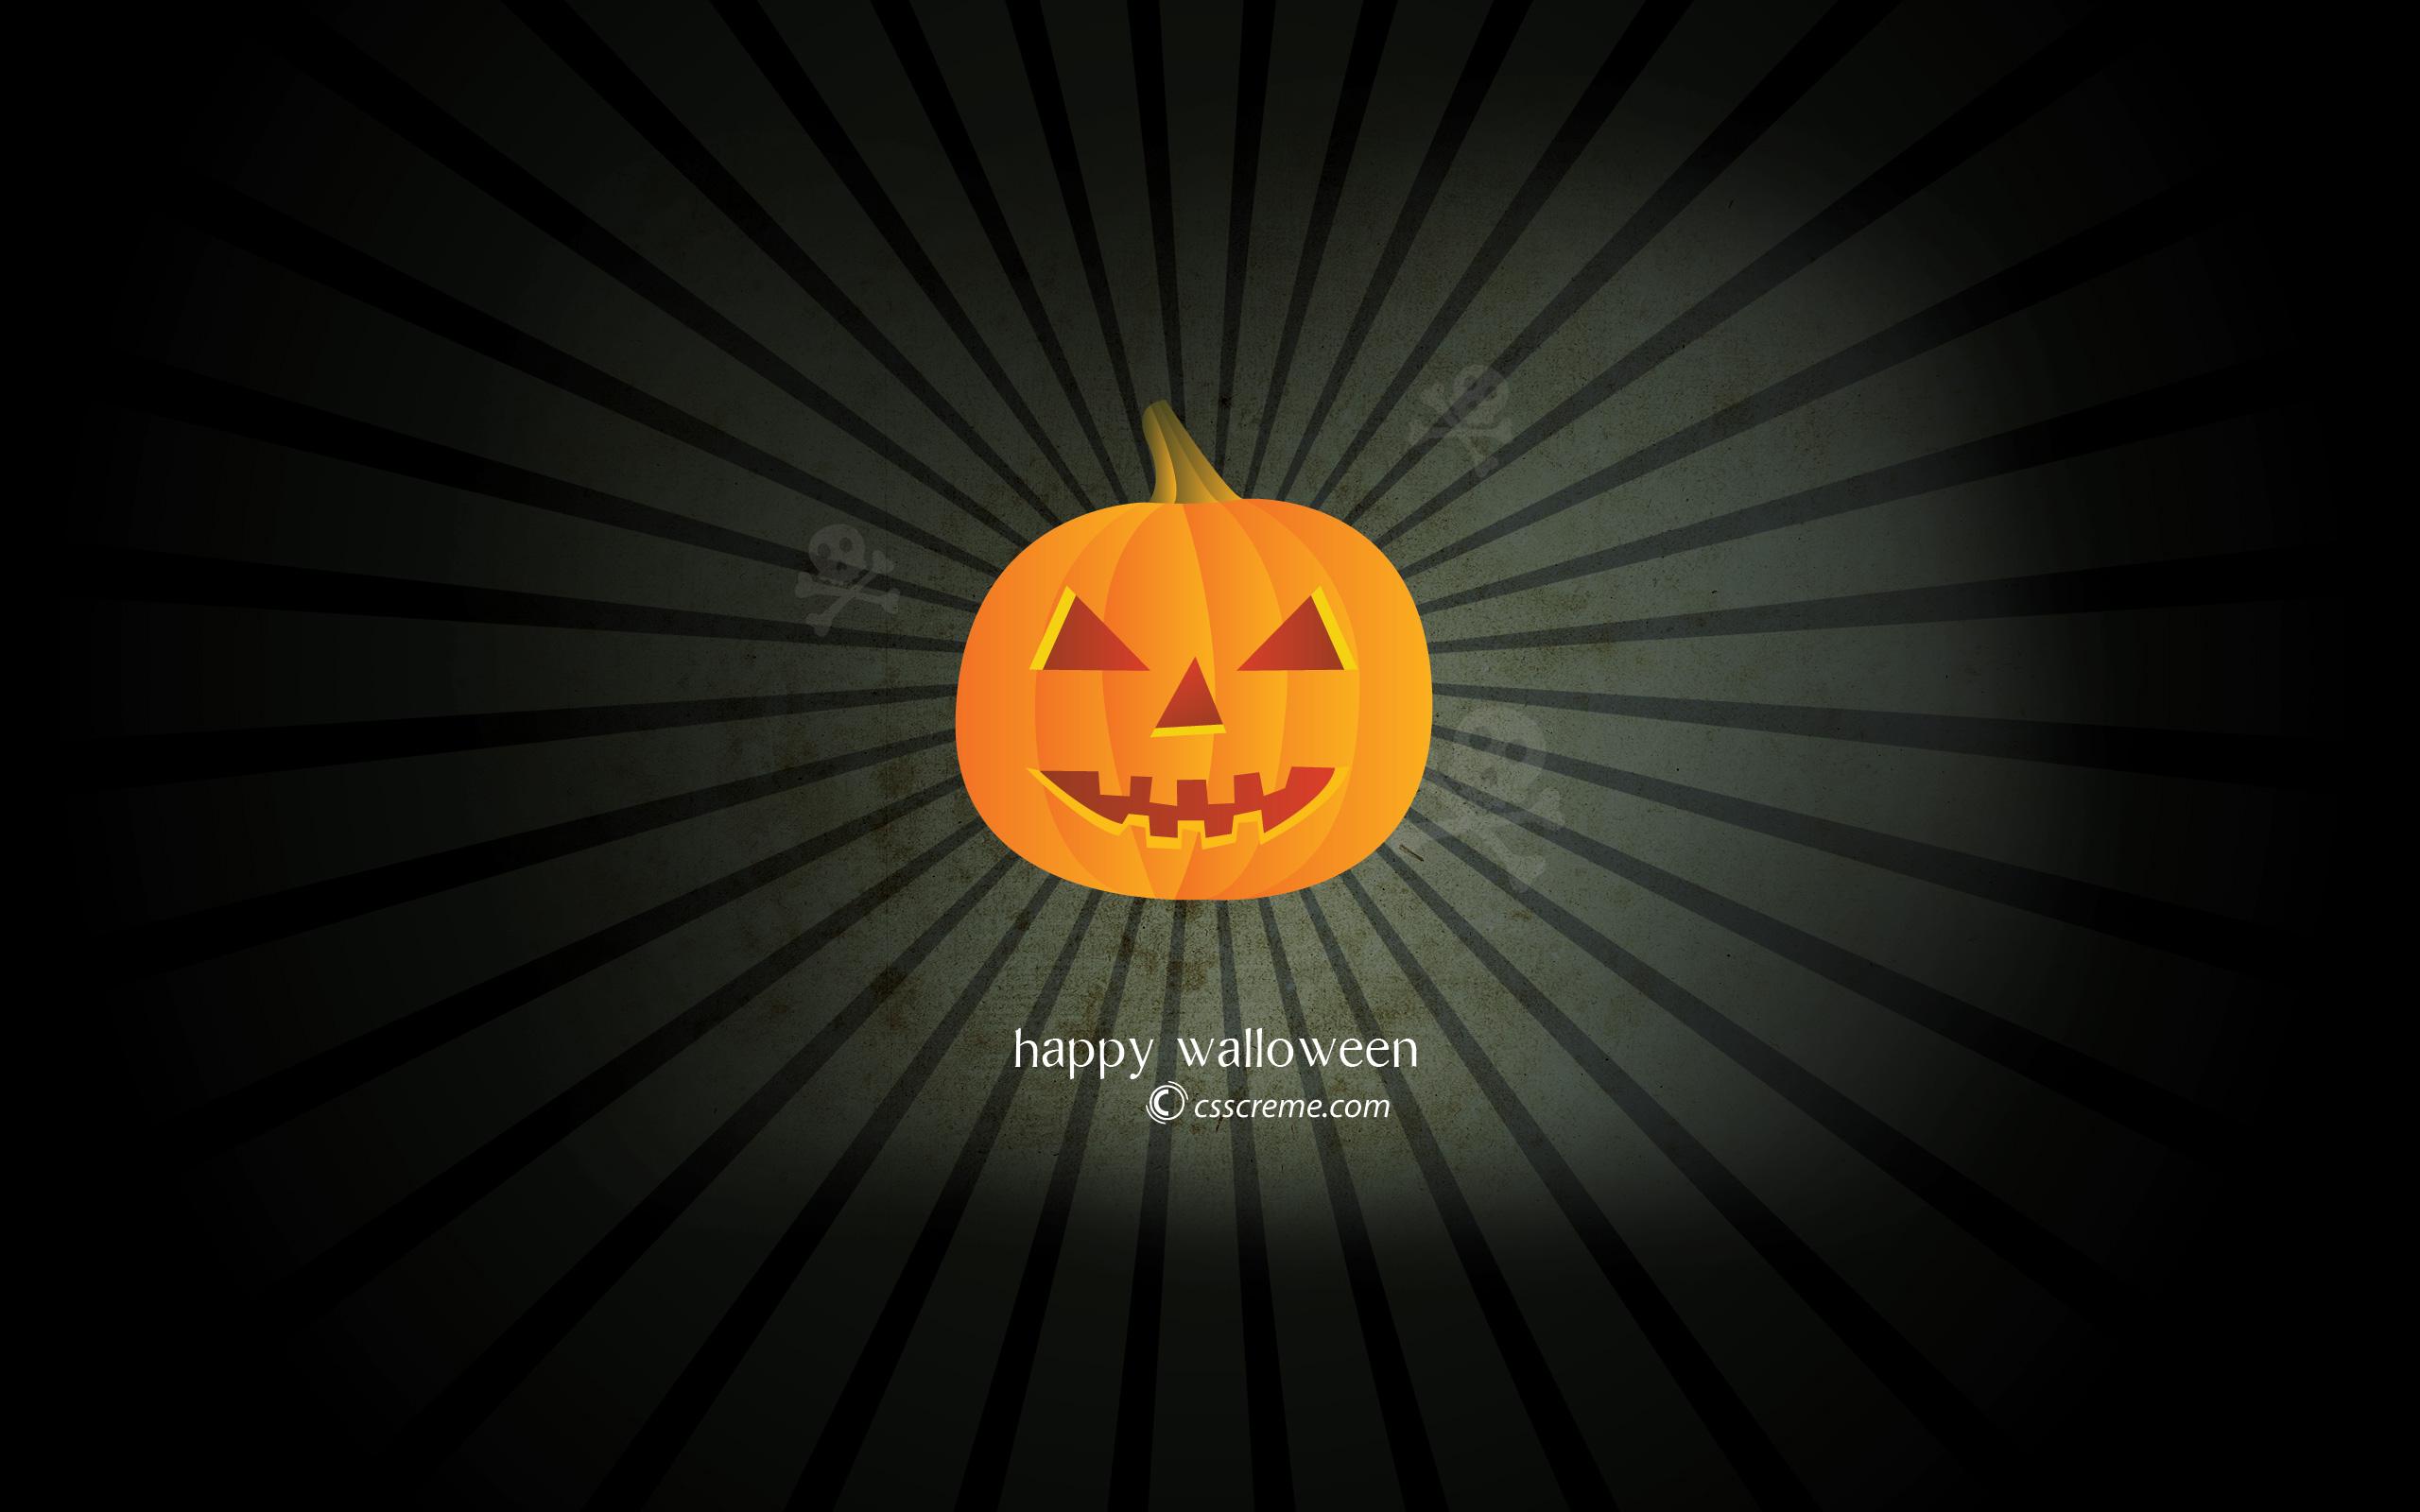 Simple Wallpaper Halloween Ipod 5 - halloween-wallpaper-large018  Image_53276.jpg